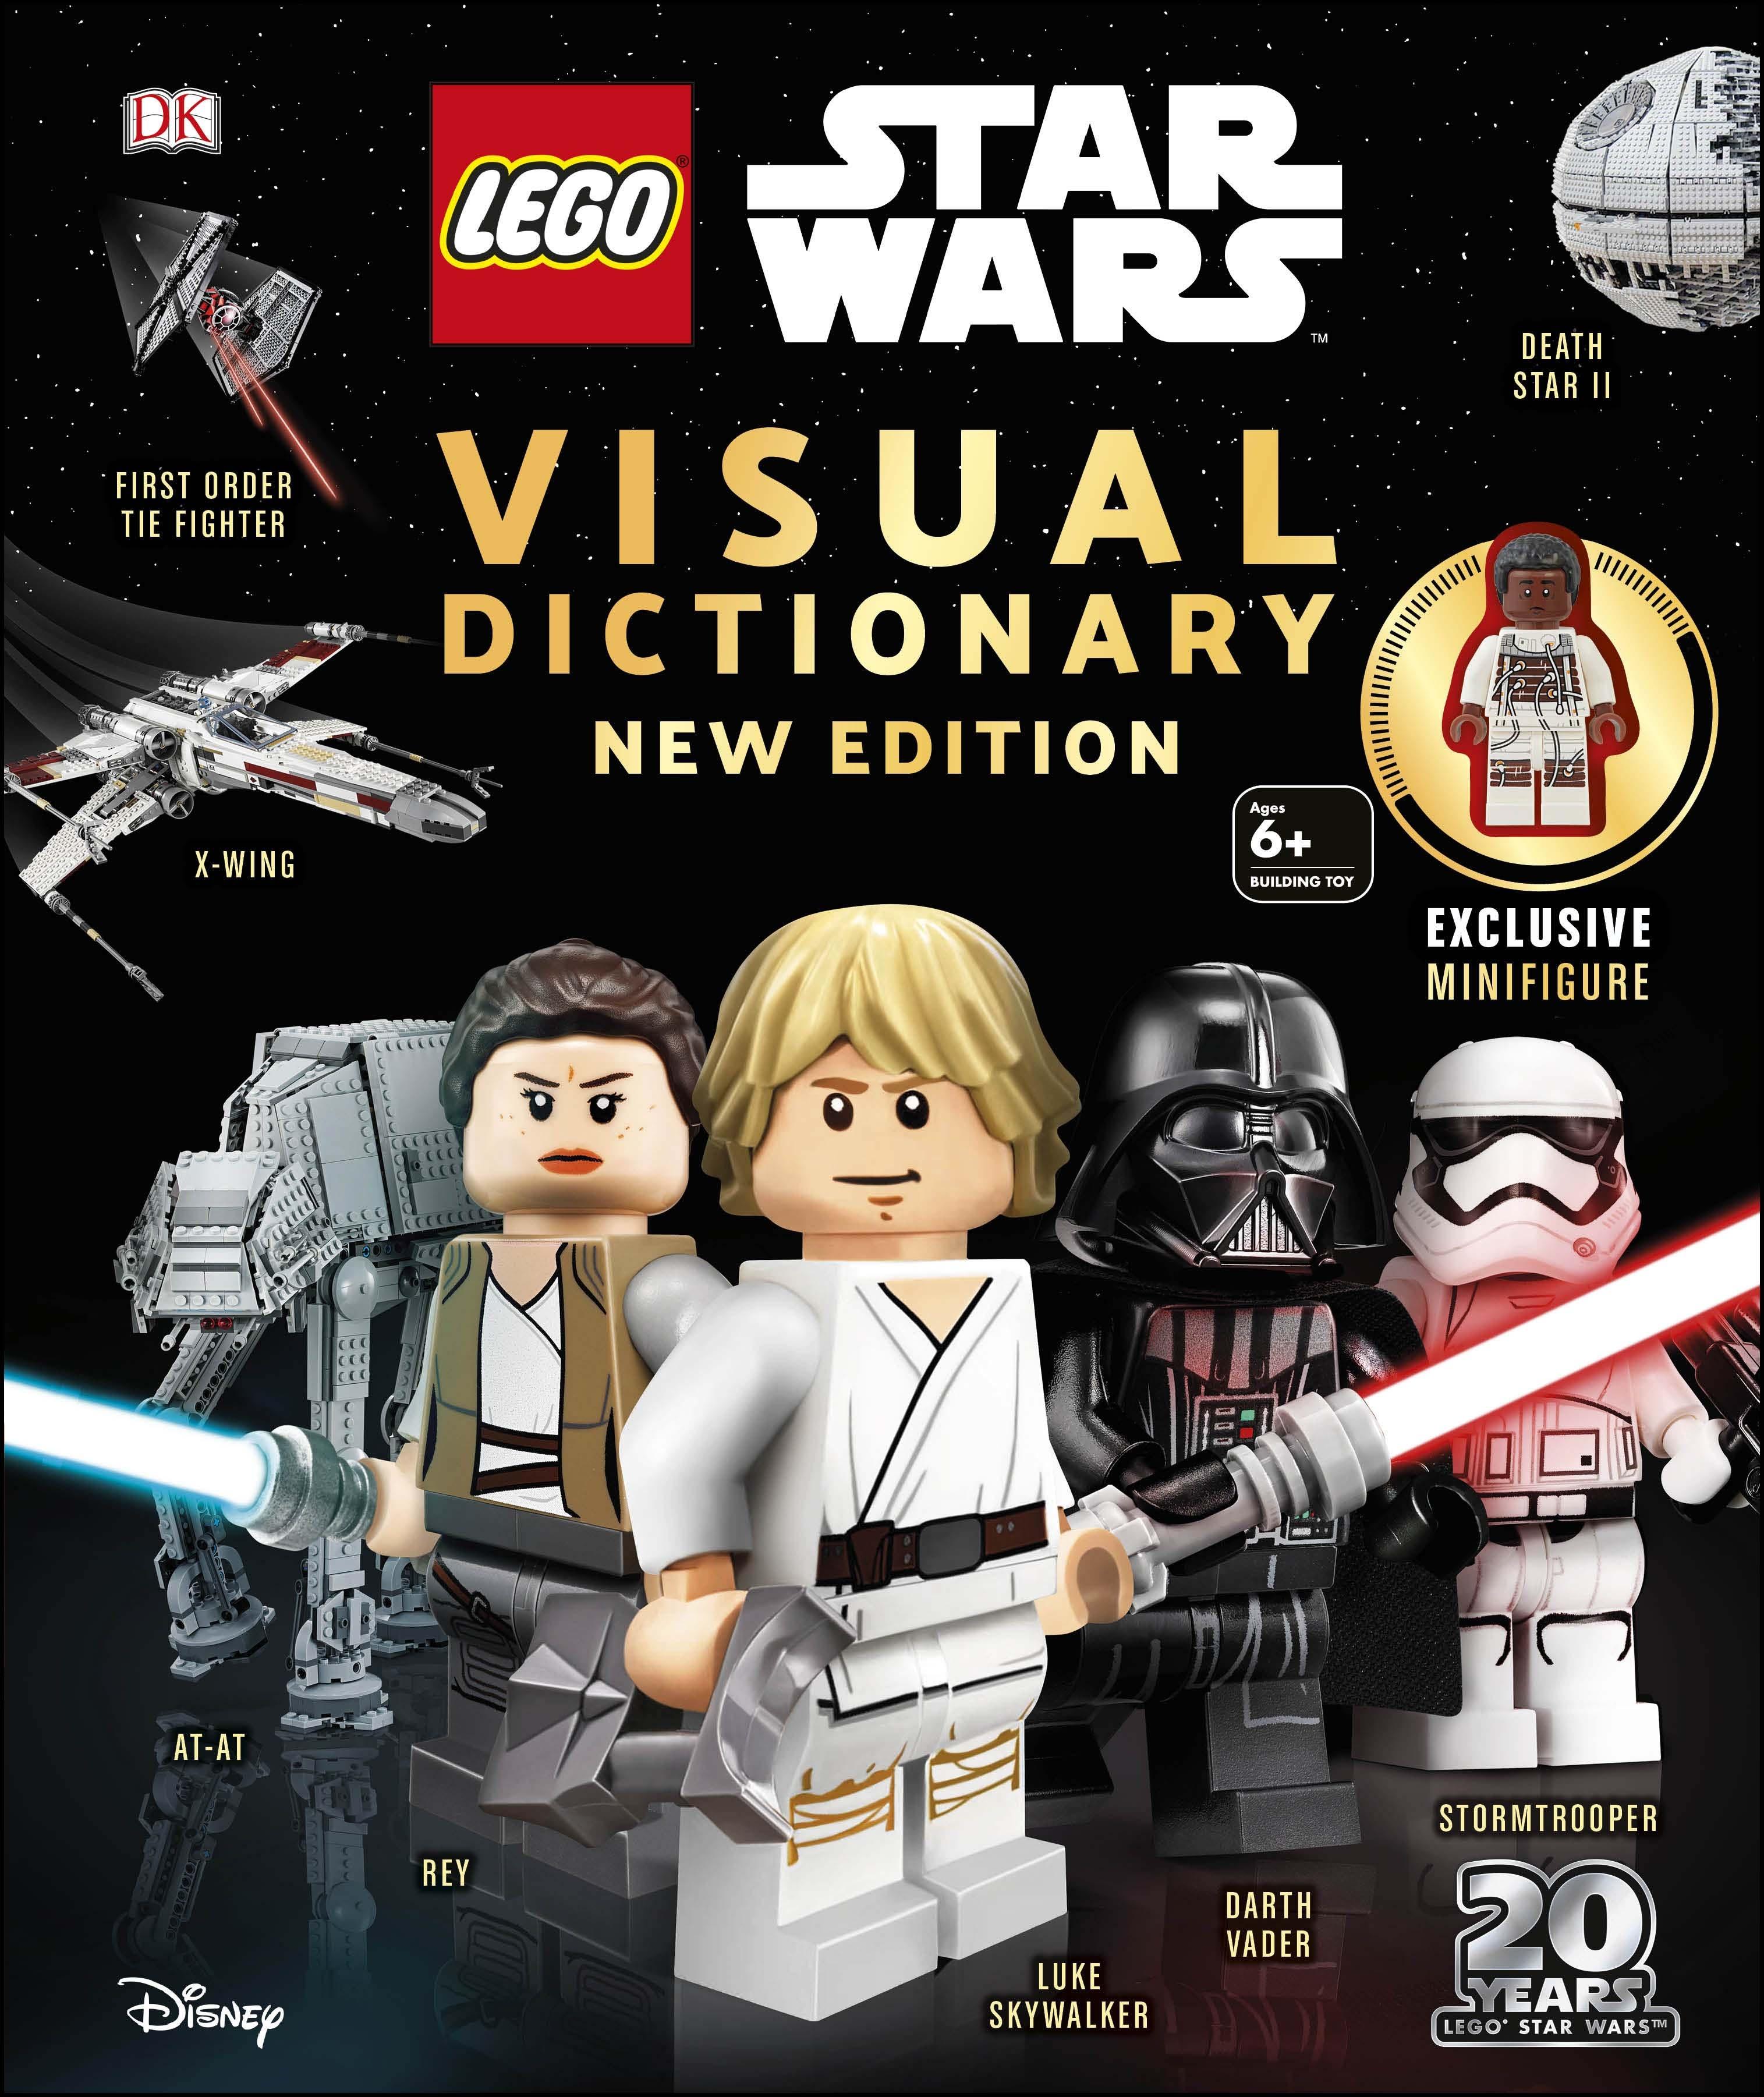 LEGO Star Wars Visual Dictionary, New Edition